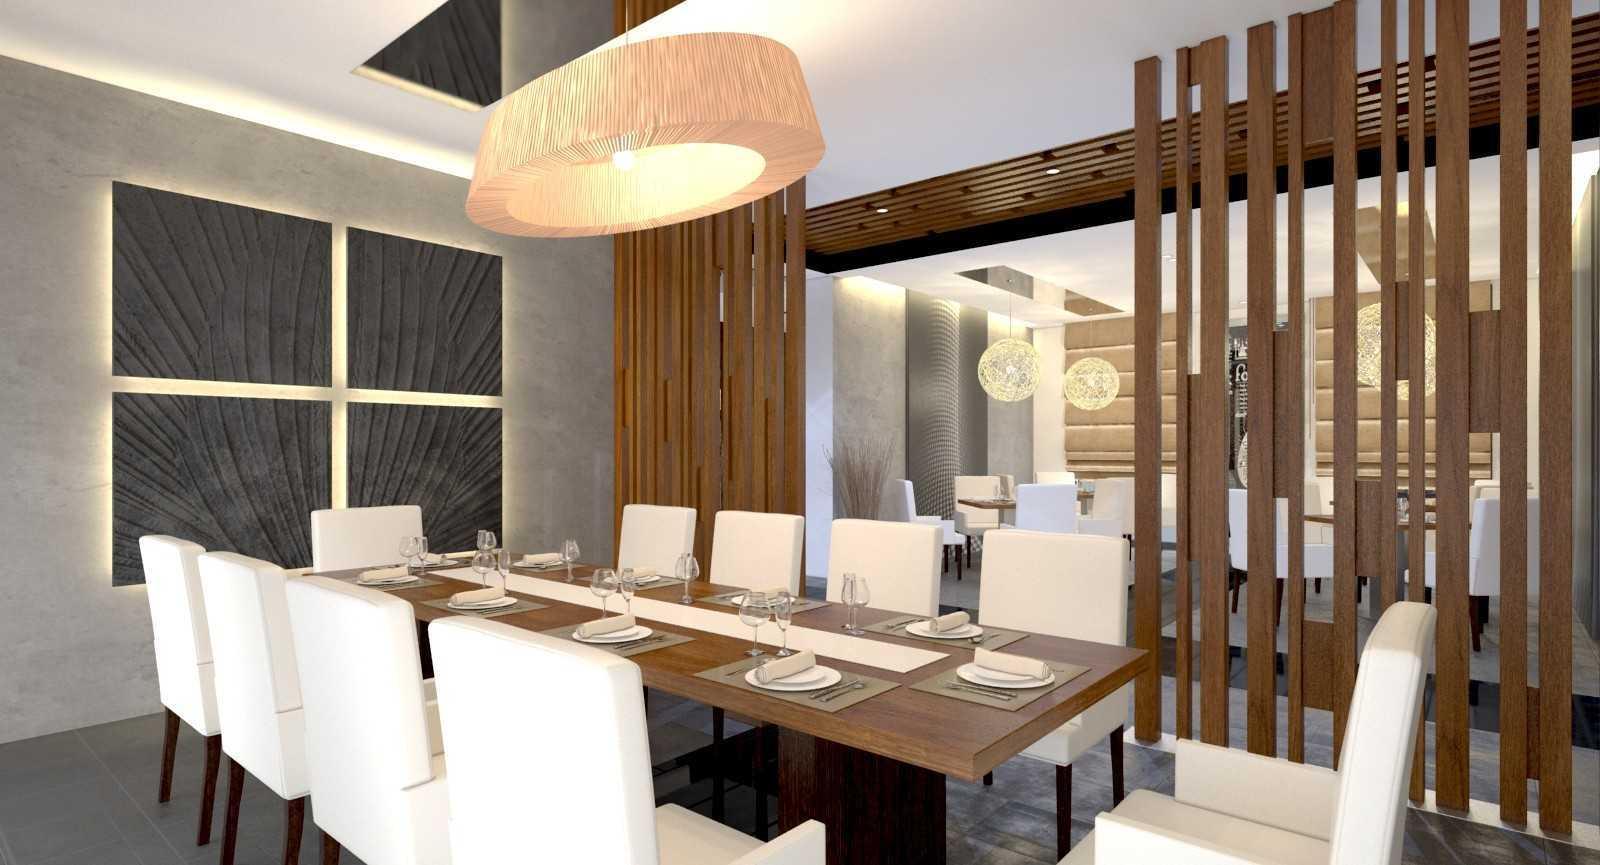 Jr Design Chef Langdon Kuningan, Jakarta Kuningan, Jakarta Tampak Conference Room Contemporary,modern  17413